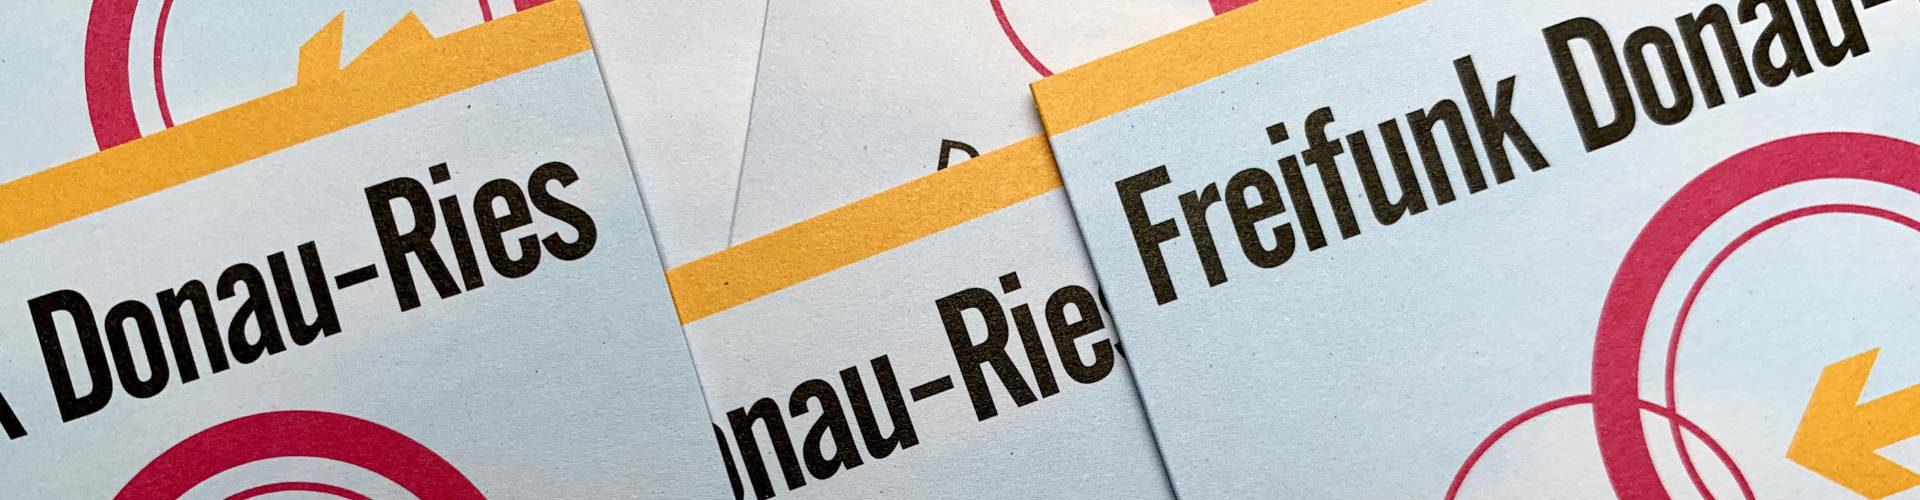 Freifunk verbindet Donau-Ries